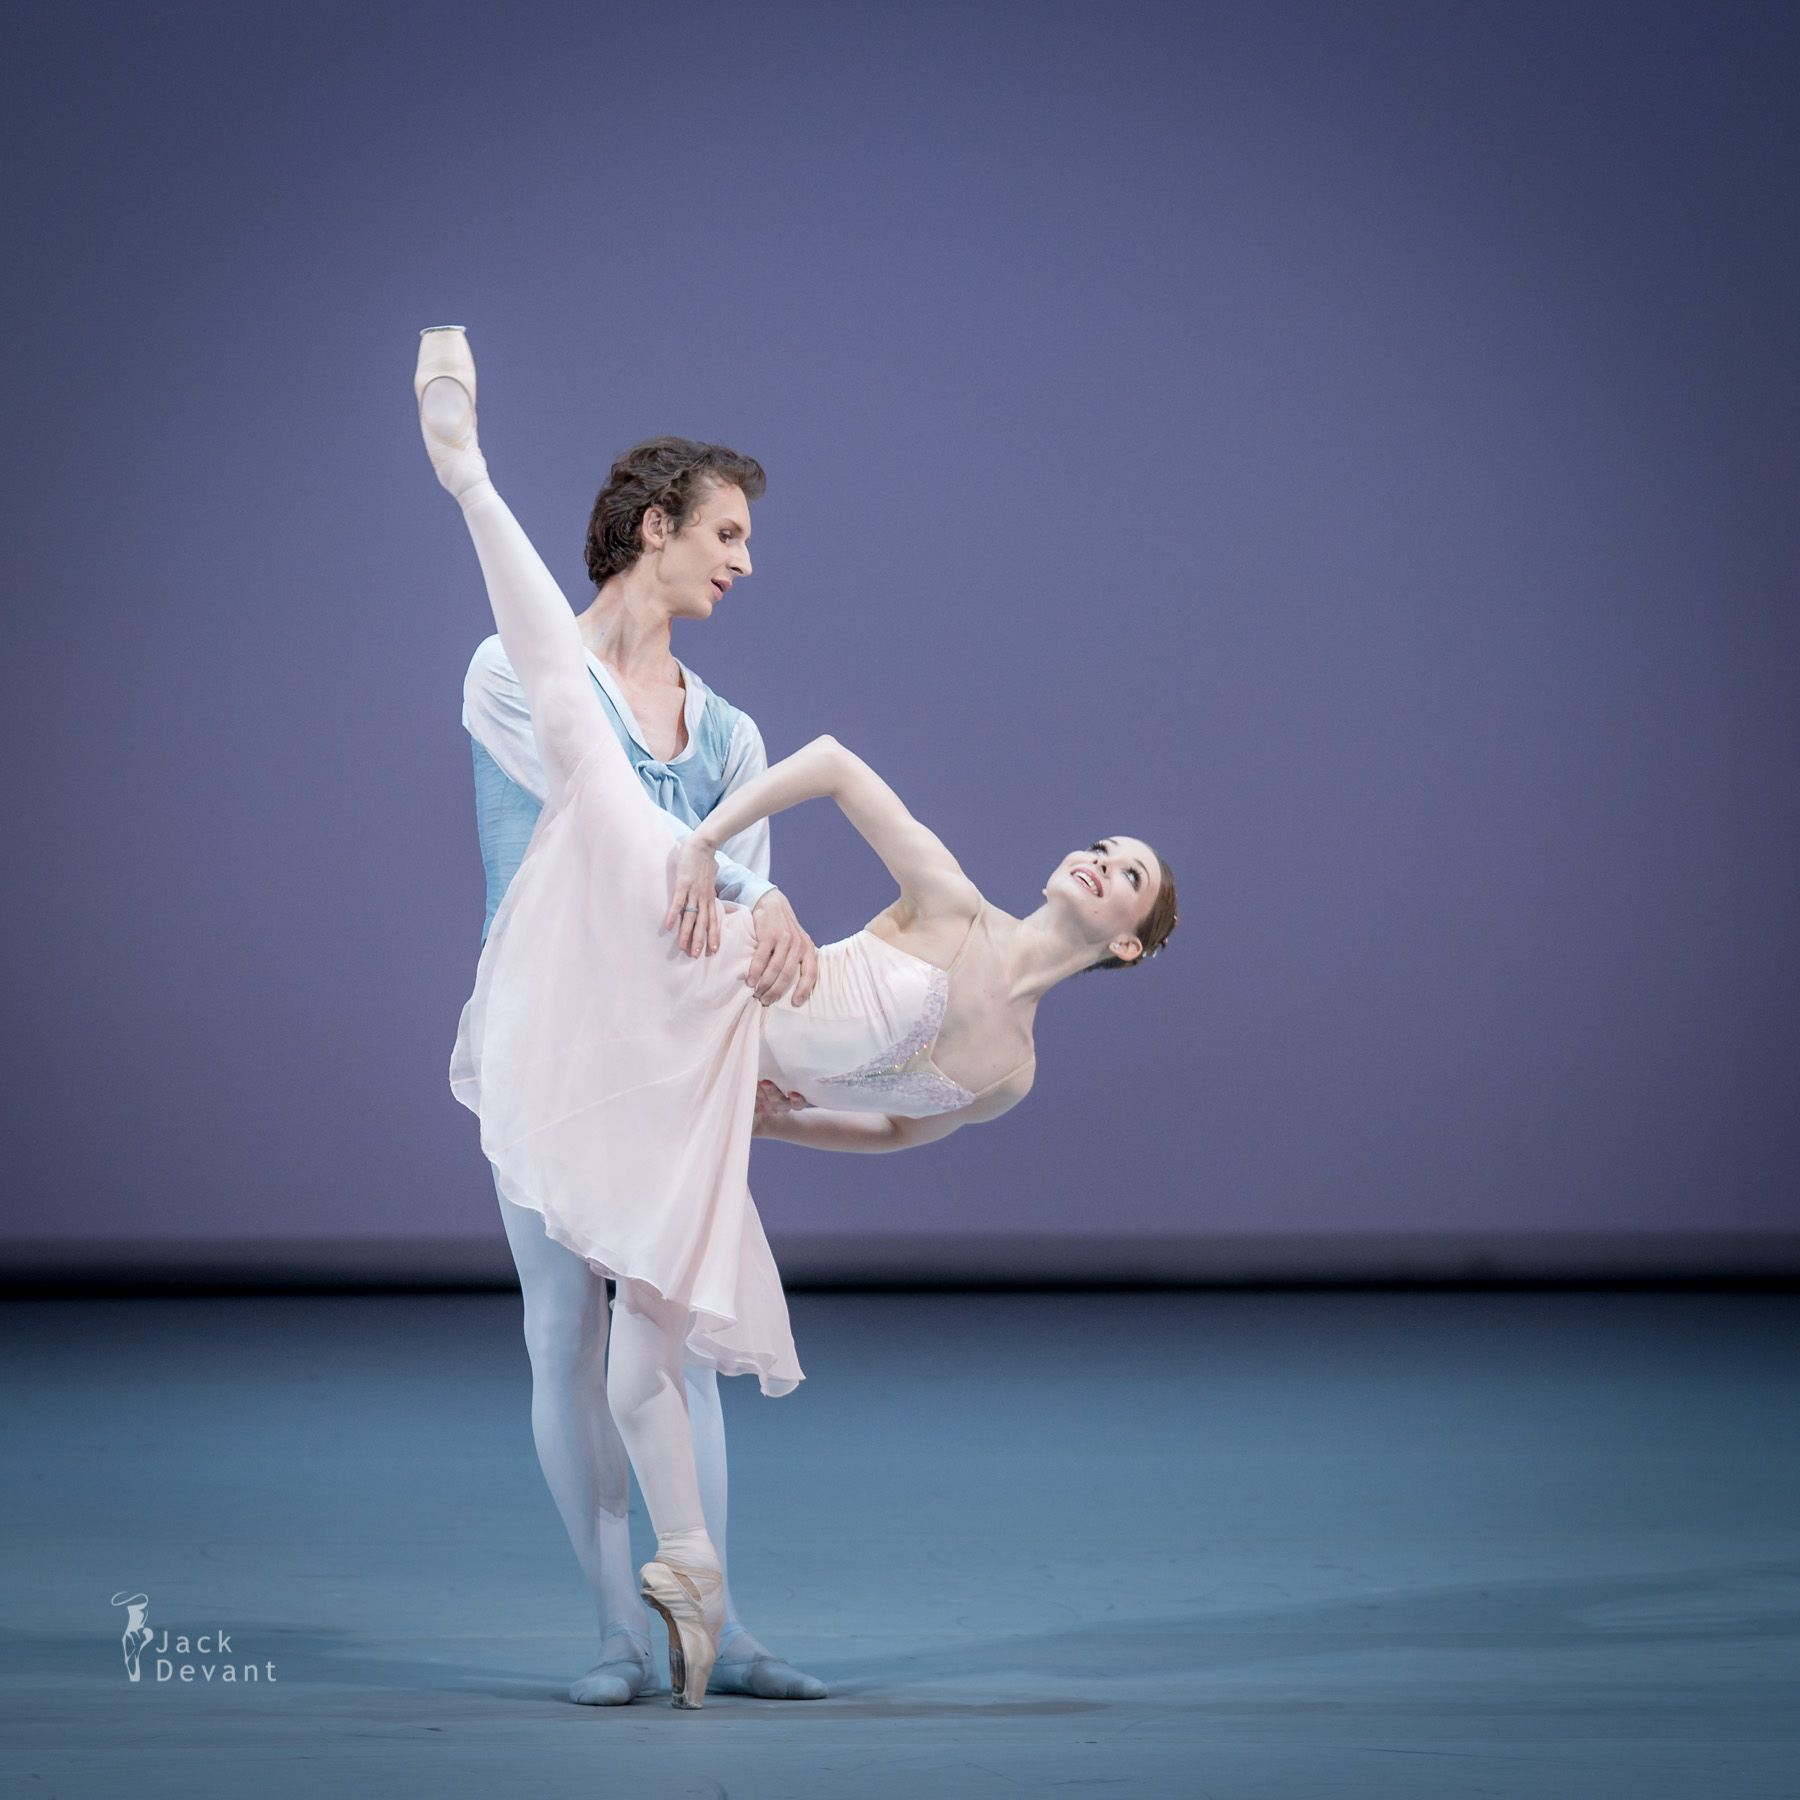 Ballerina Yevgenia Obraztsova: career, repertoire, personal life 91